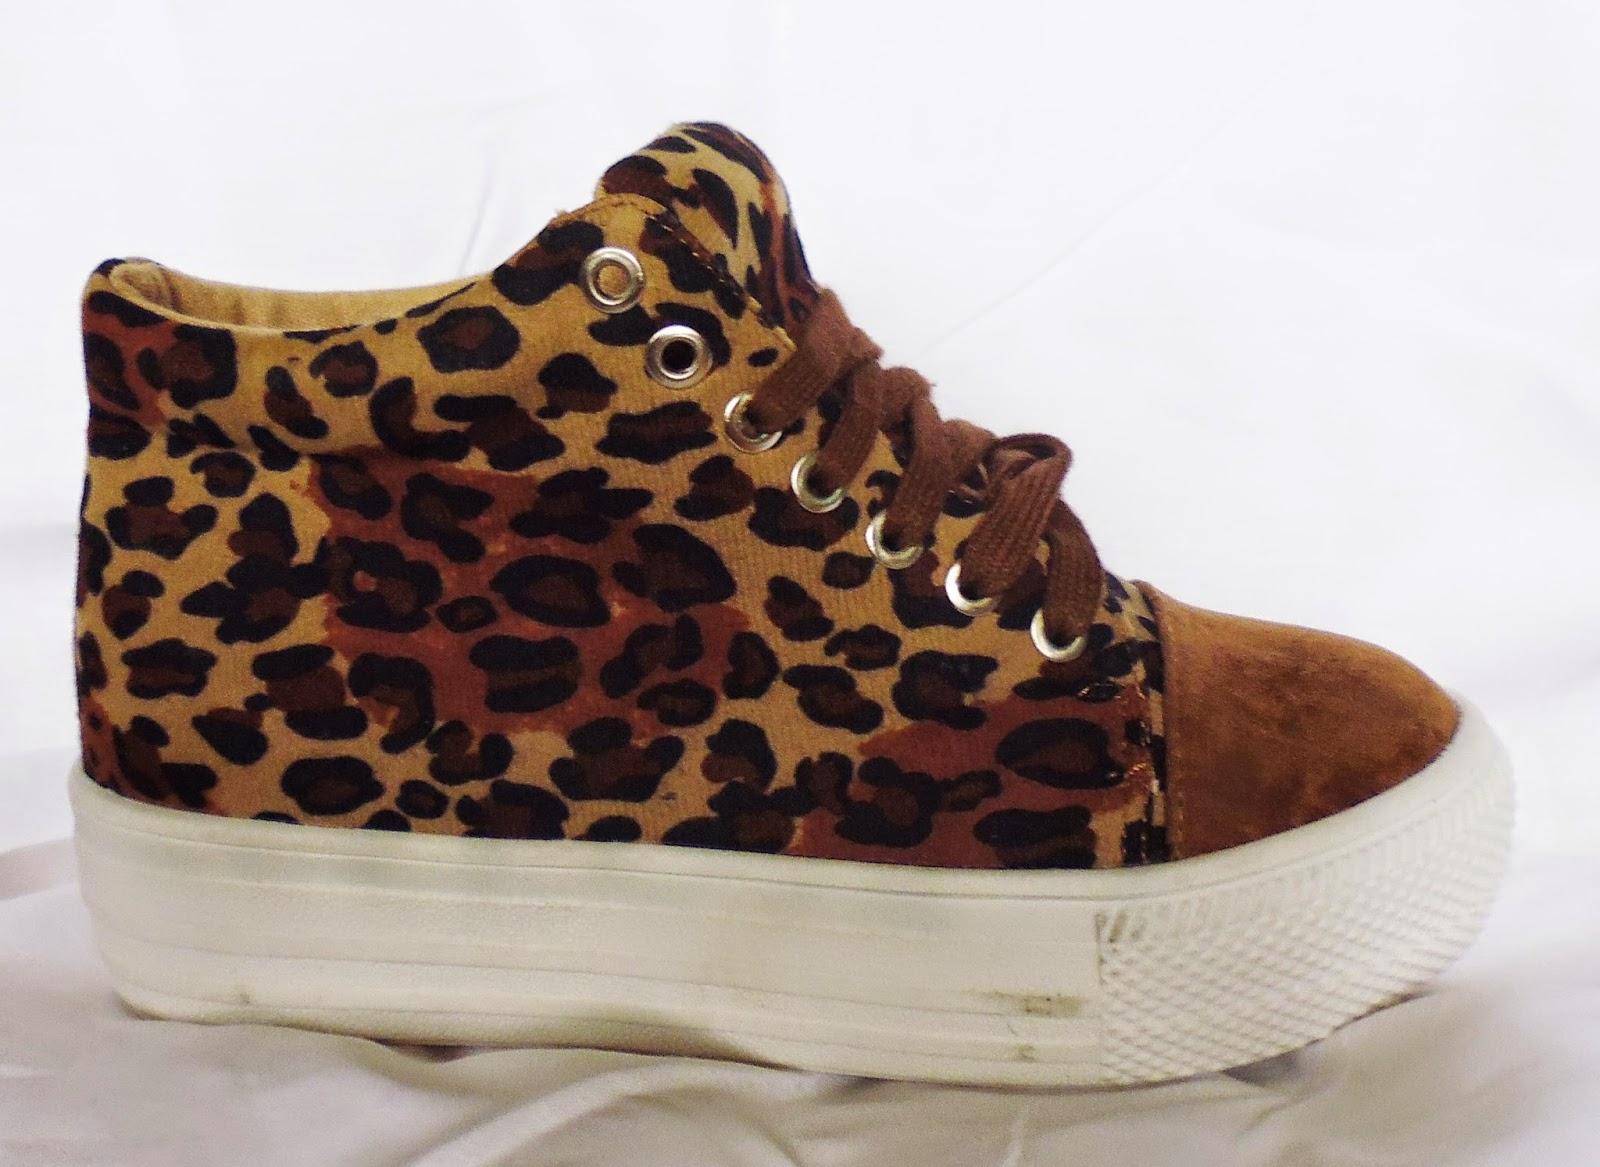 http://www.ebay.fr/itm/baskets-plates-leopard-semelle-epaisse-35-36-37-38-39-40-41-confortables-jolies-/301190668760?ssPageName=STRK:MESE:IT